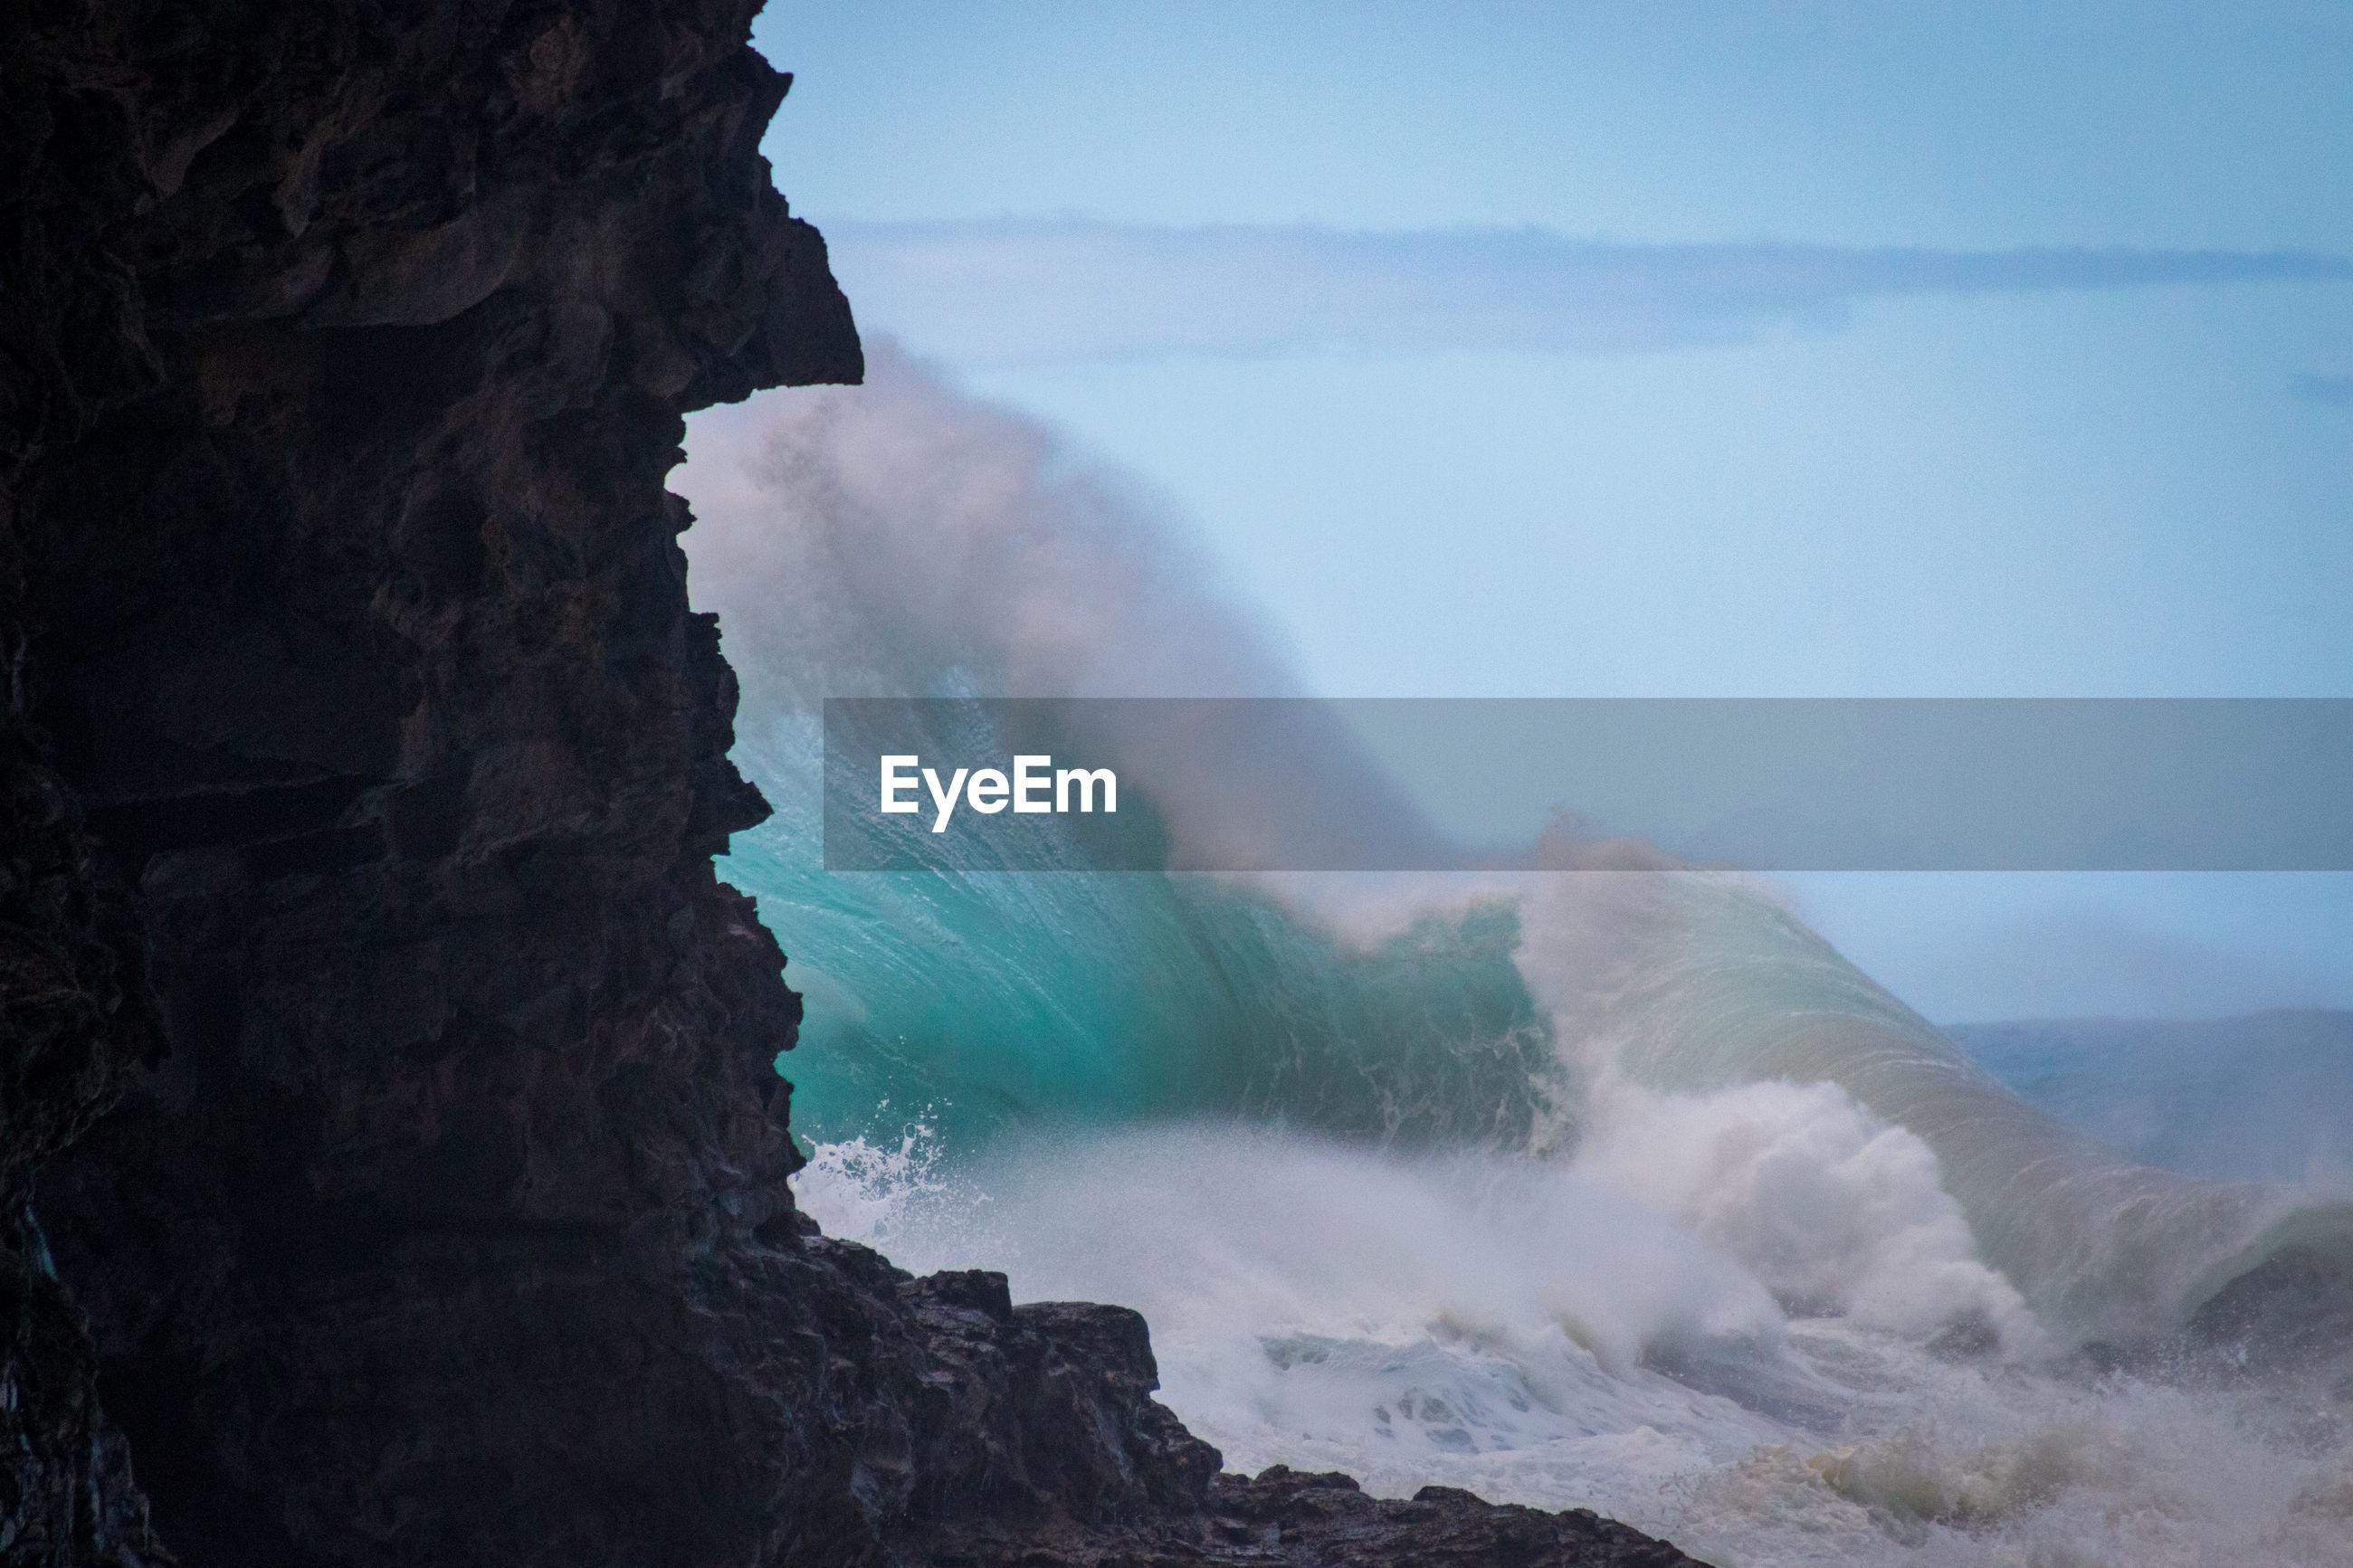 Spectaculat waves crashing at hanakapiai beach on the hawaiian island of kauai, usa against sky